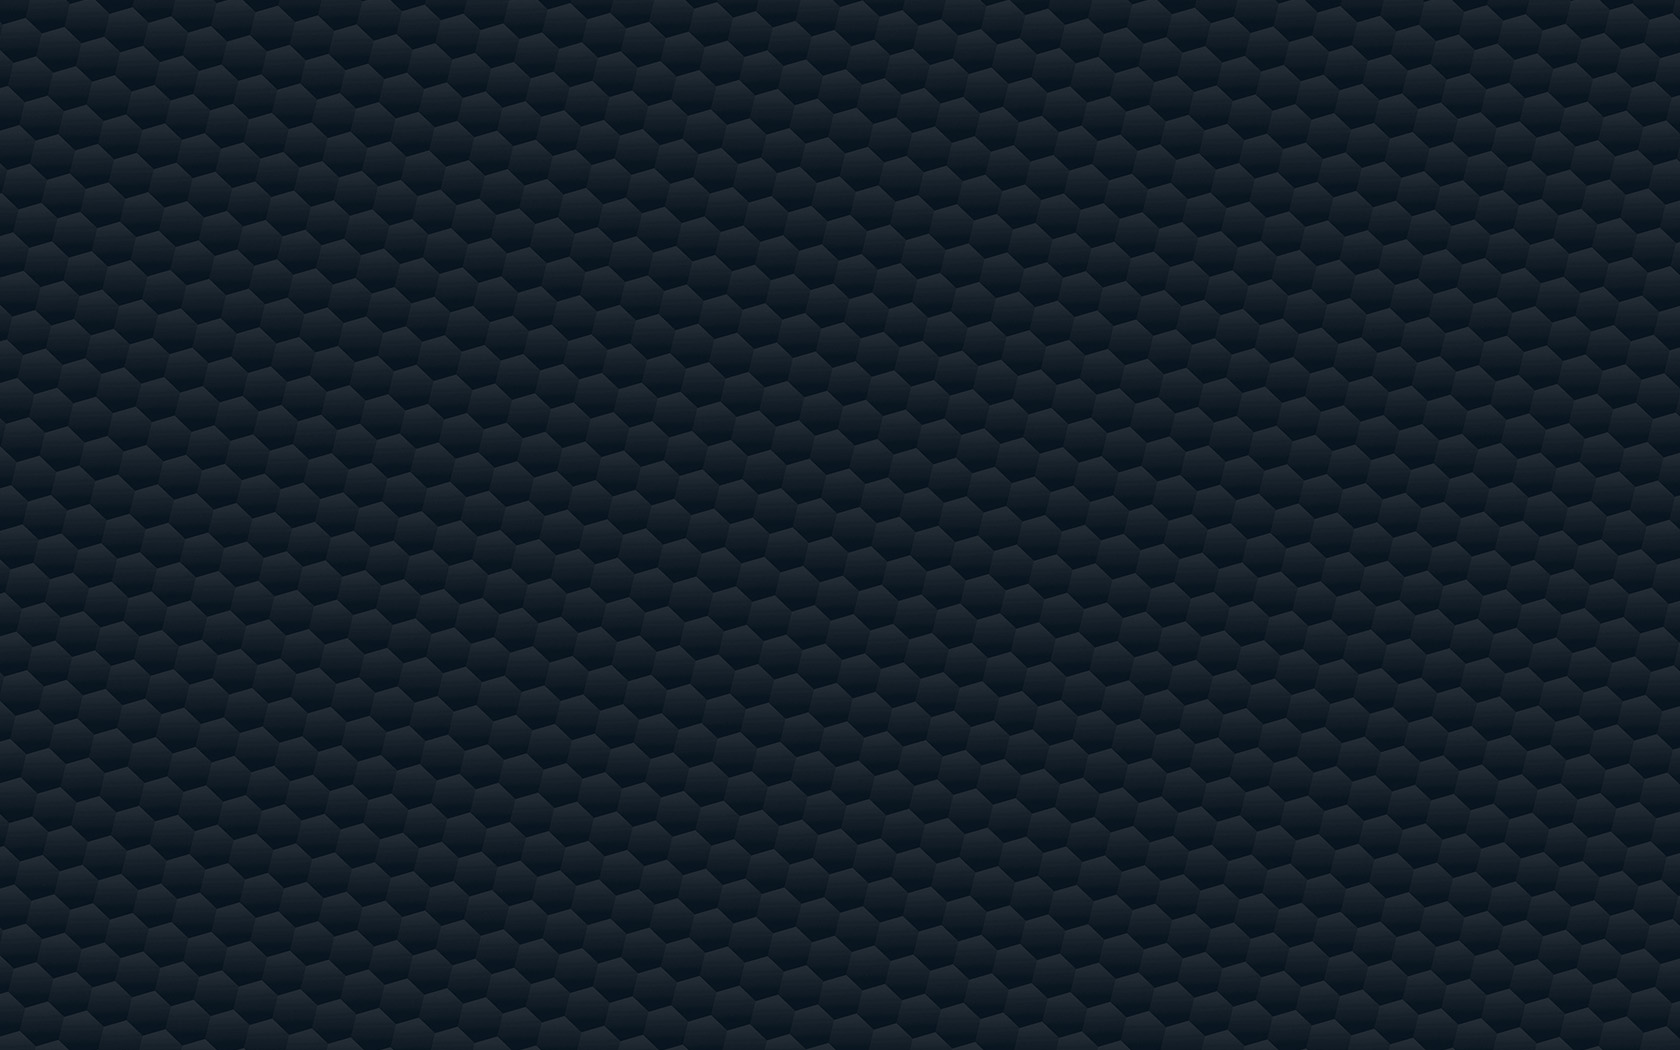 Wallpaper Macbook Air Fall Art Vj36 Honeycomb Dark Blue Poly Pattern Wallpaper